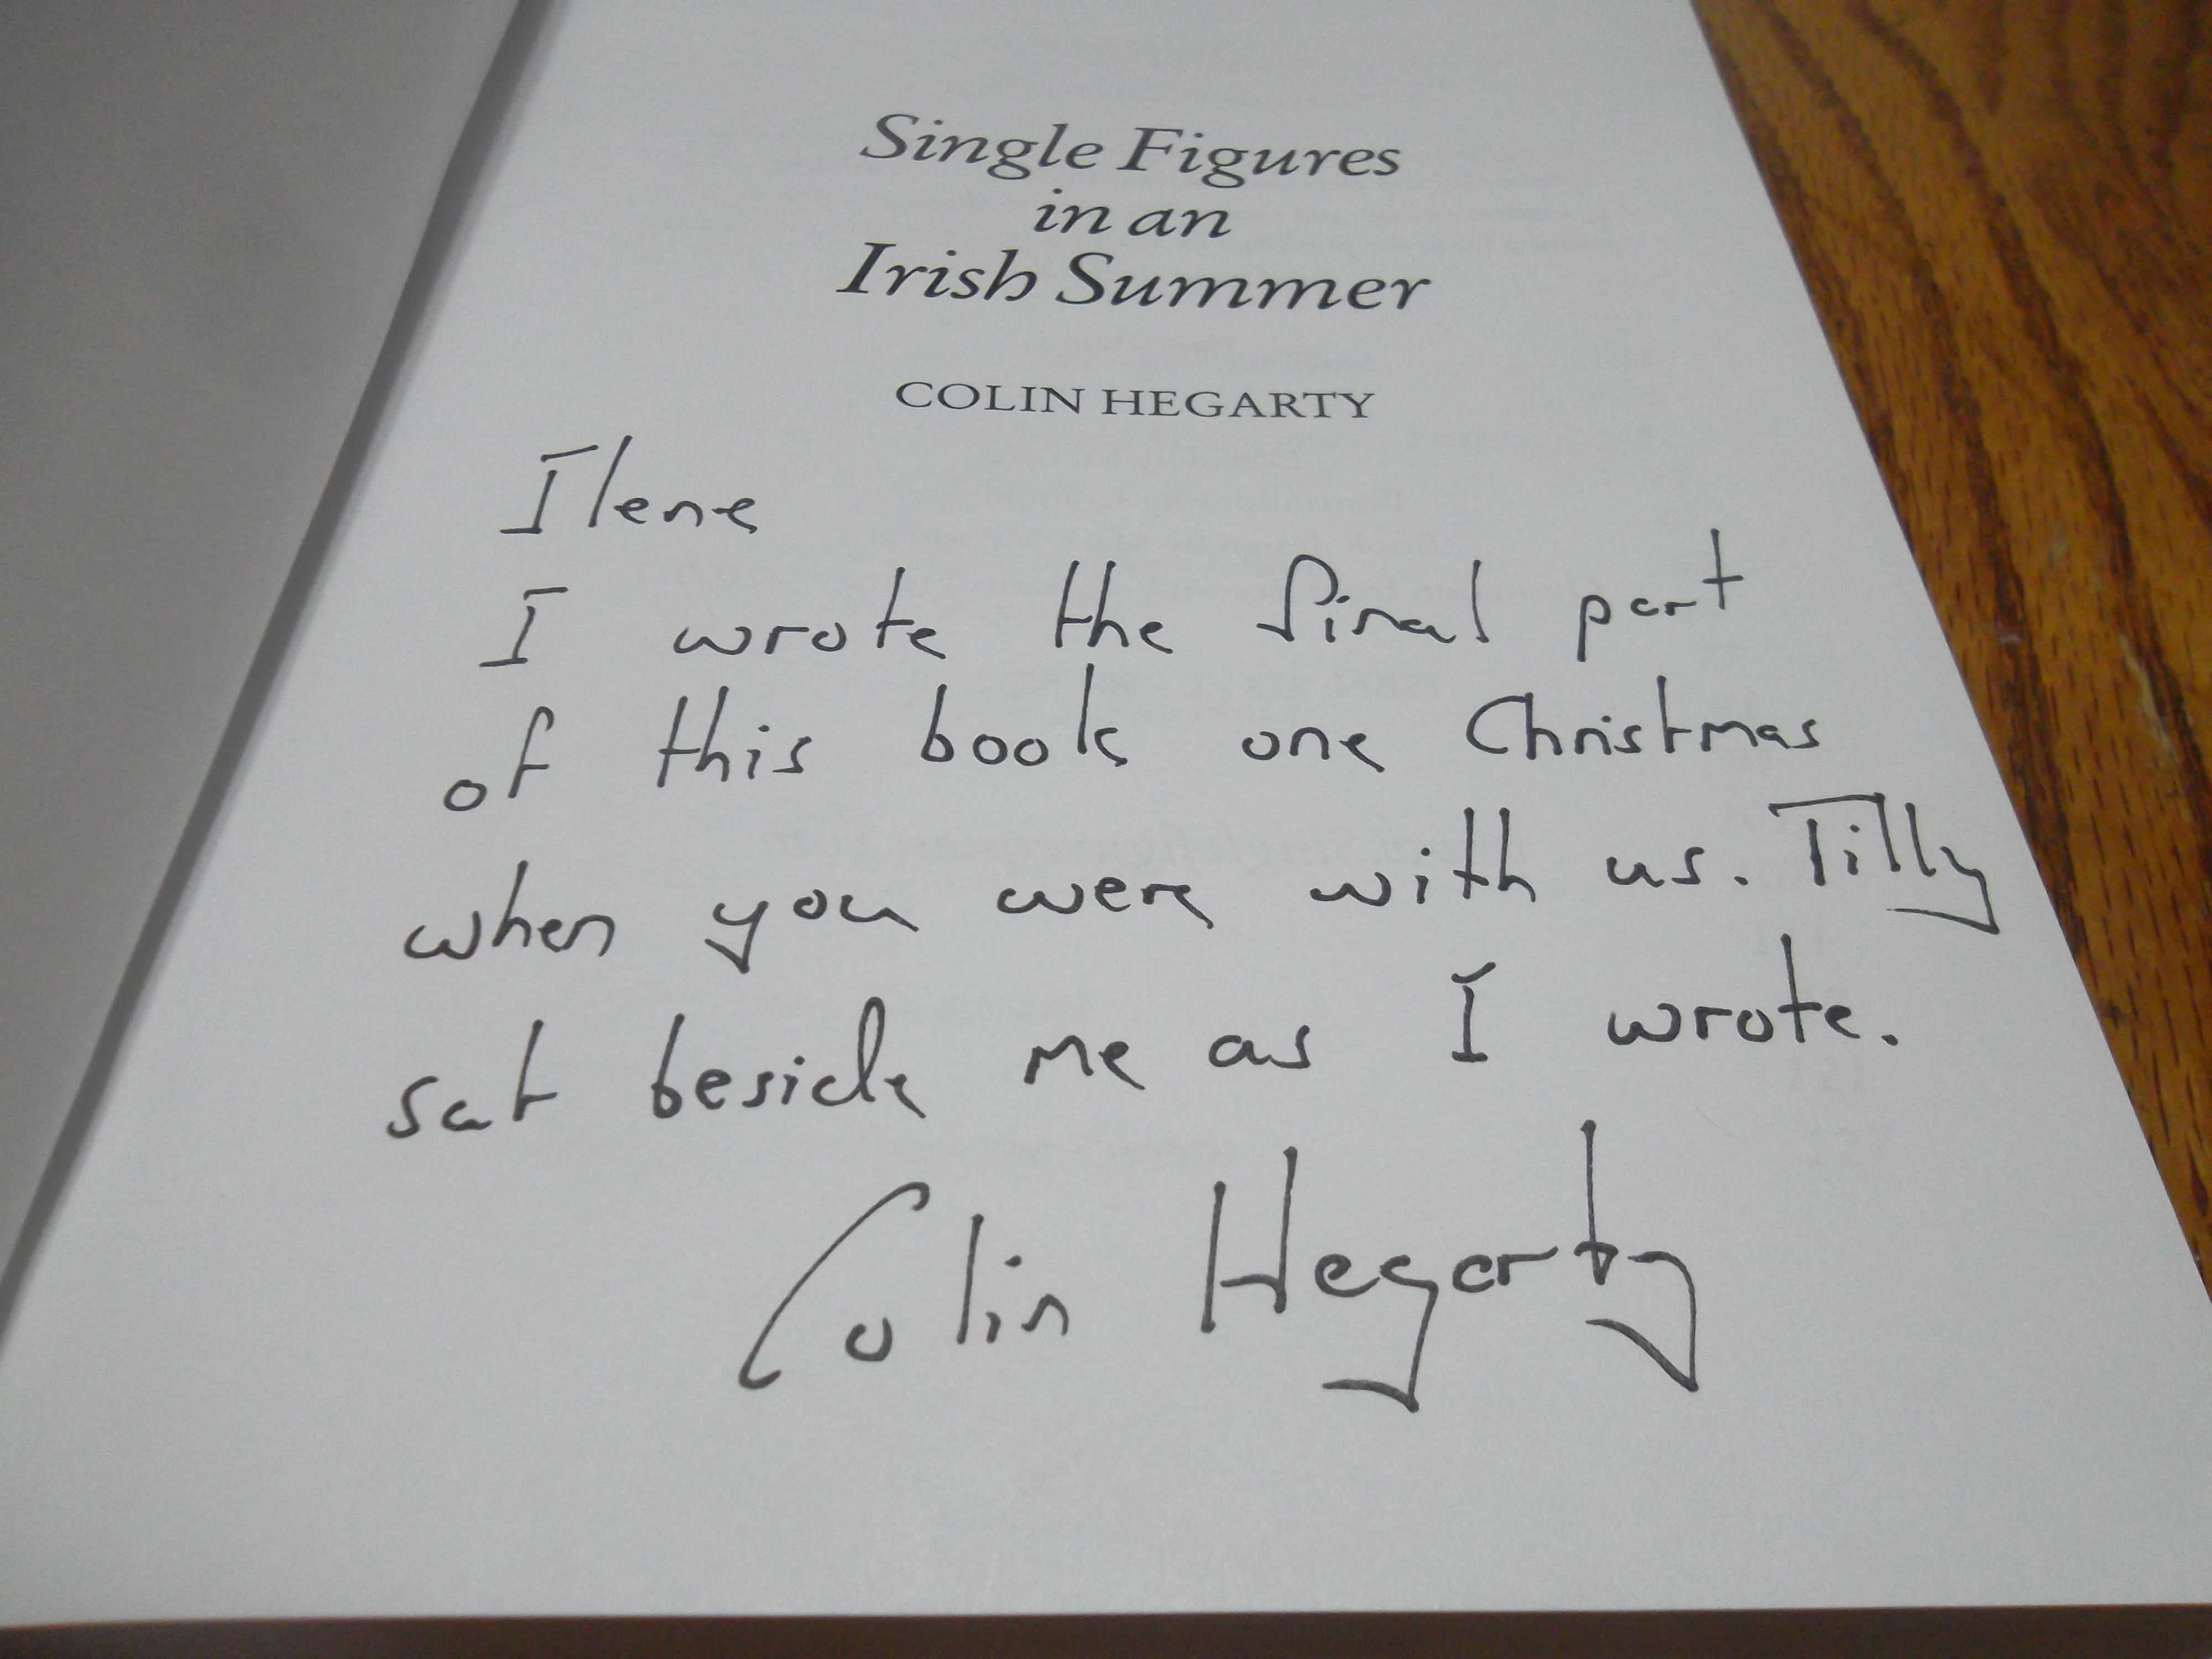 Single Figures in an Irish Summer